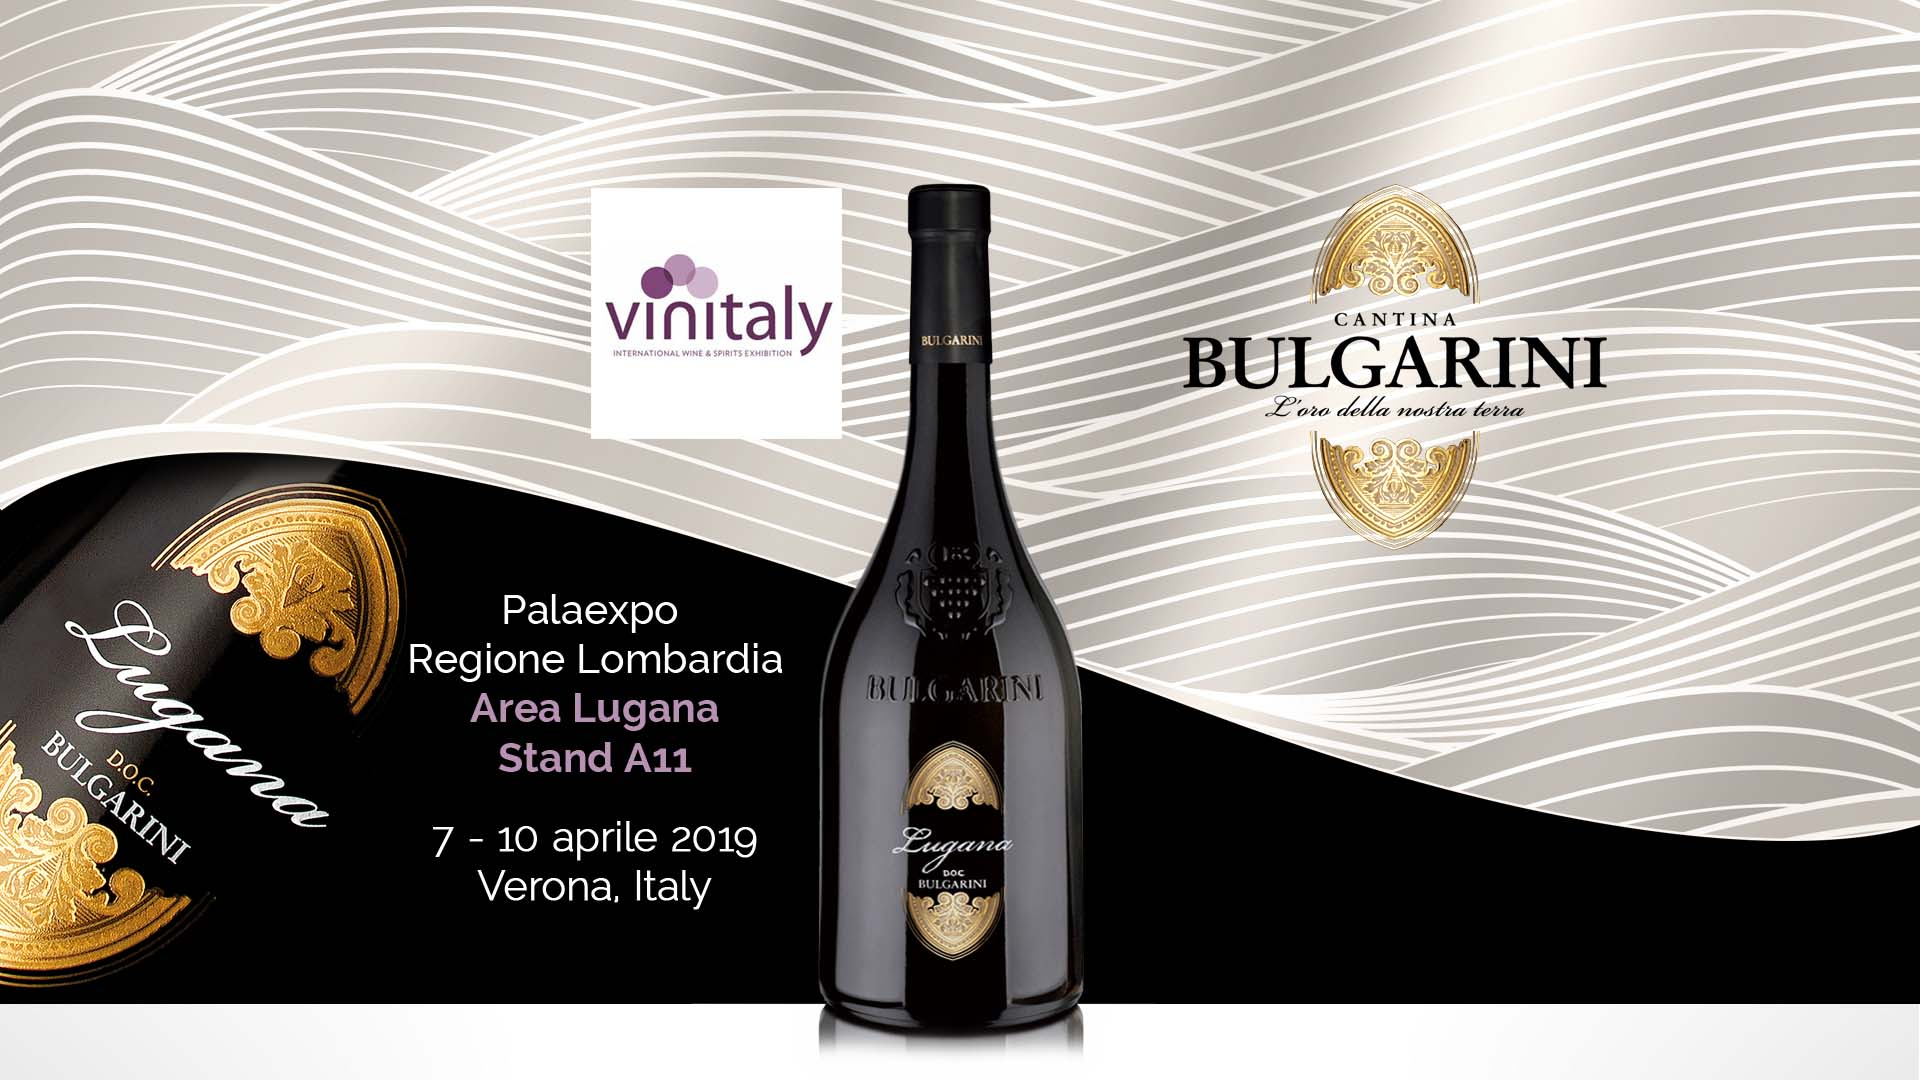 Slide Bulgarini Vinitaly 2019